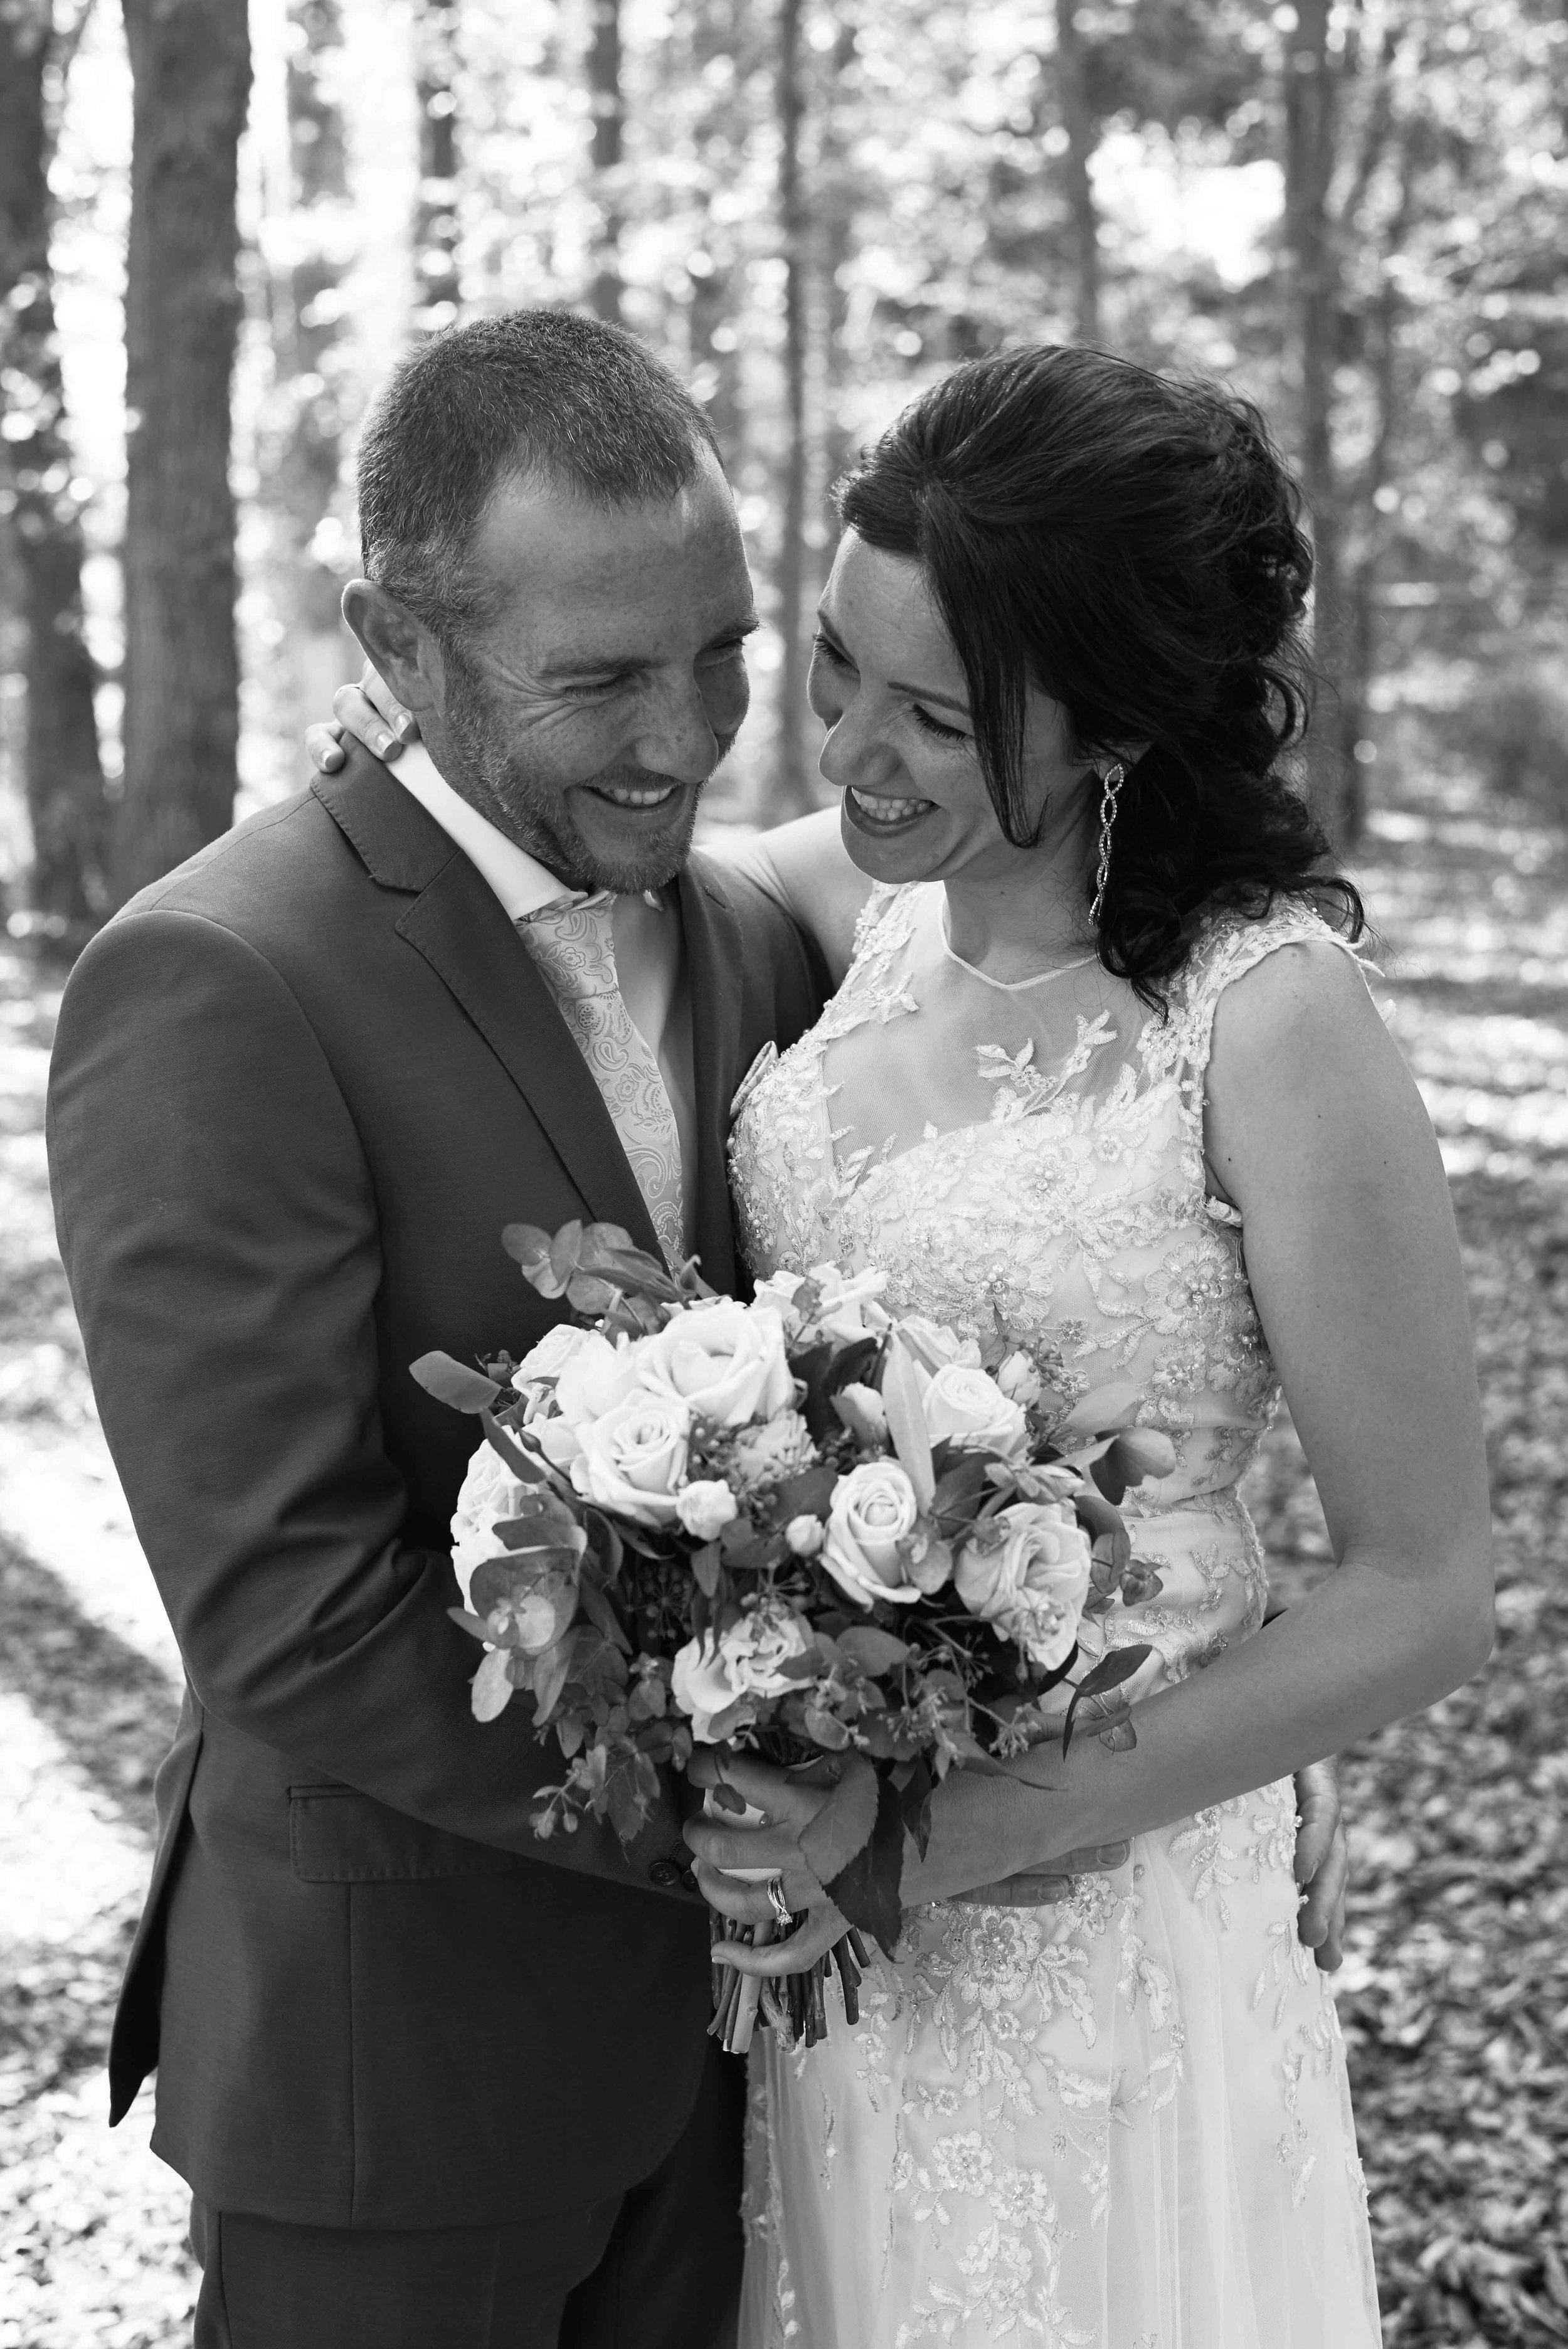 sorrento-wedding-photography-all-smiles-marissa-jade-photography-140.jpg